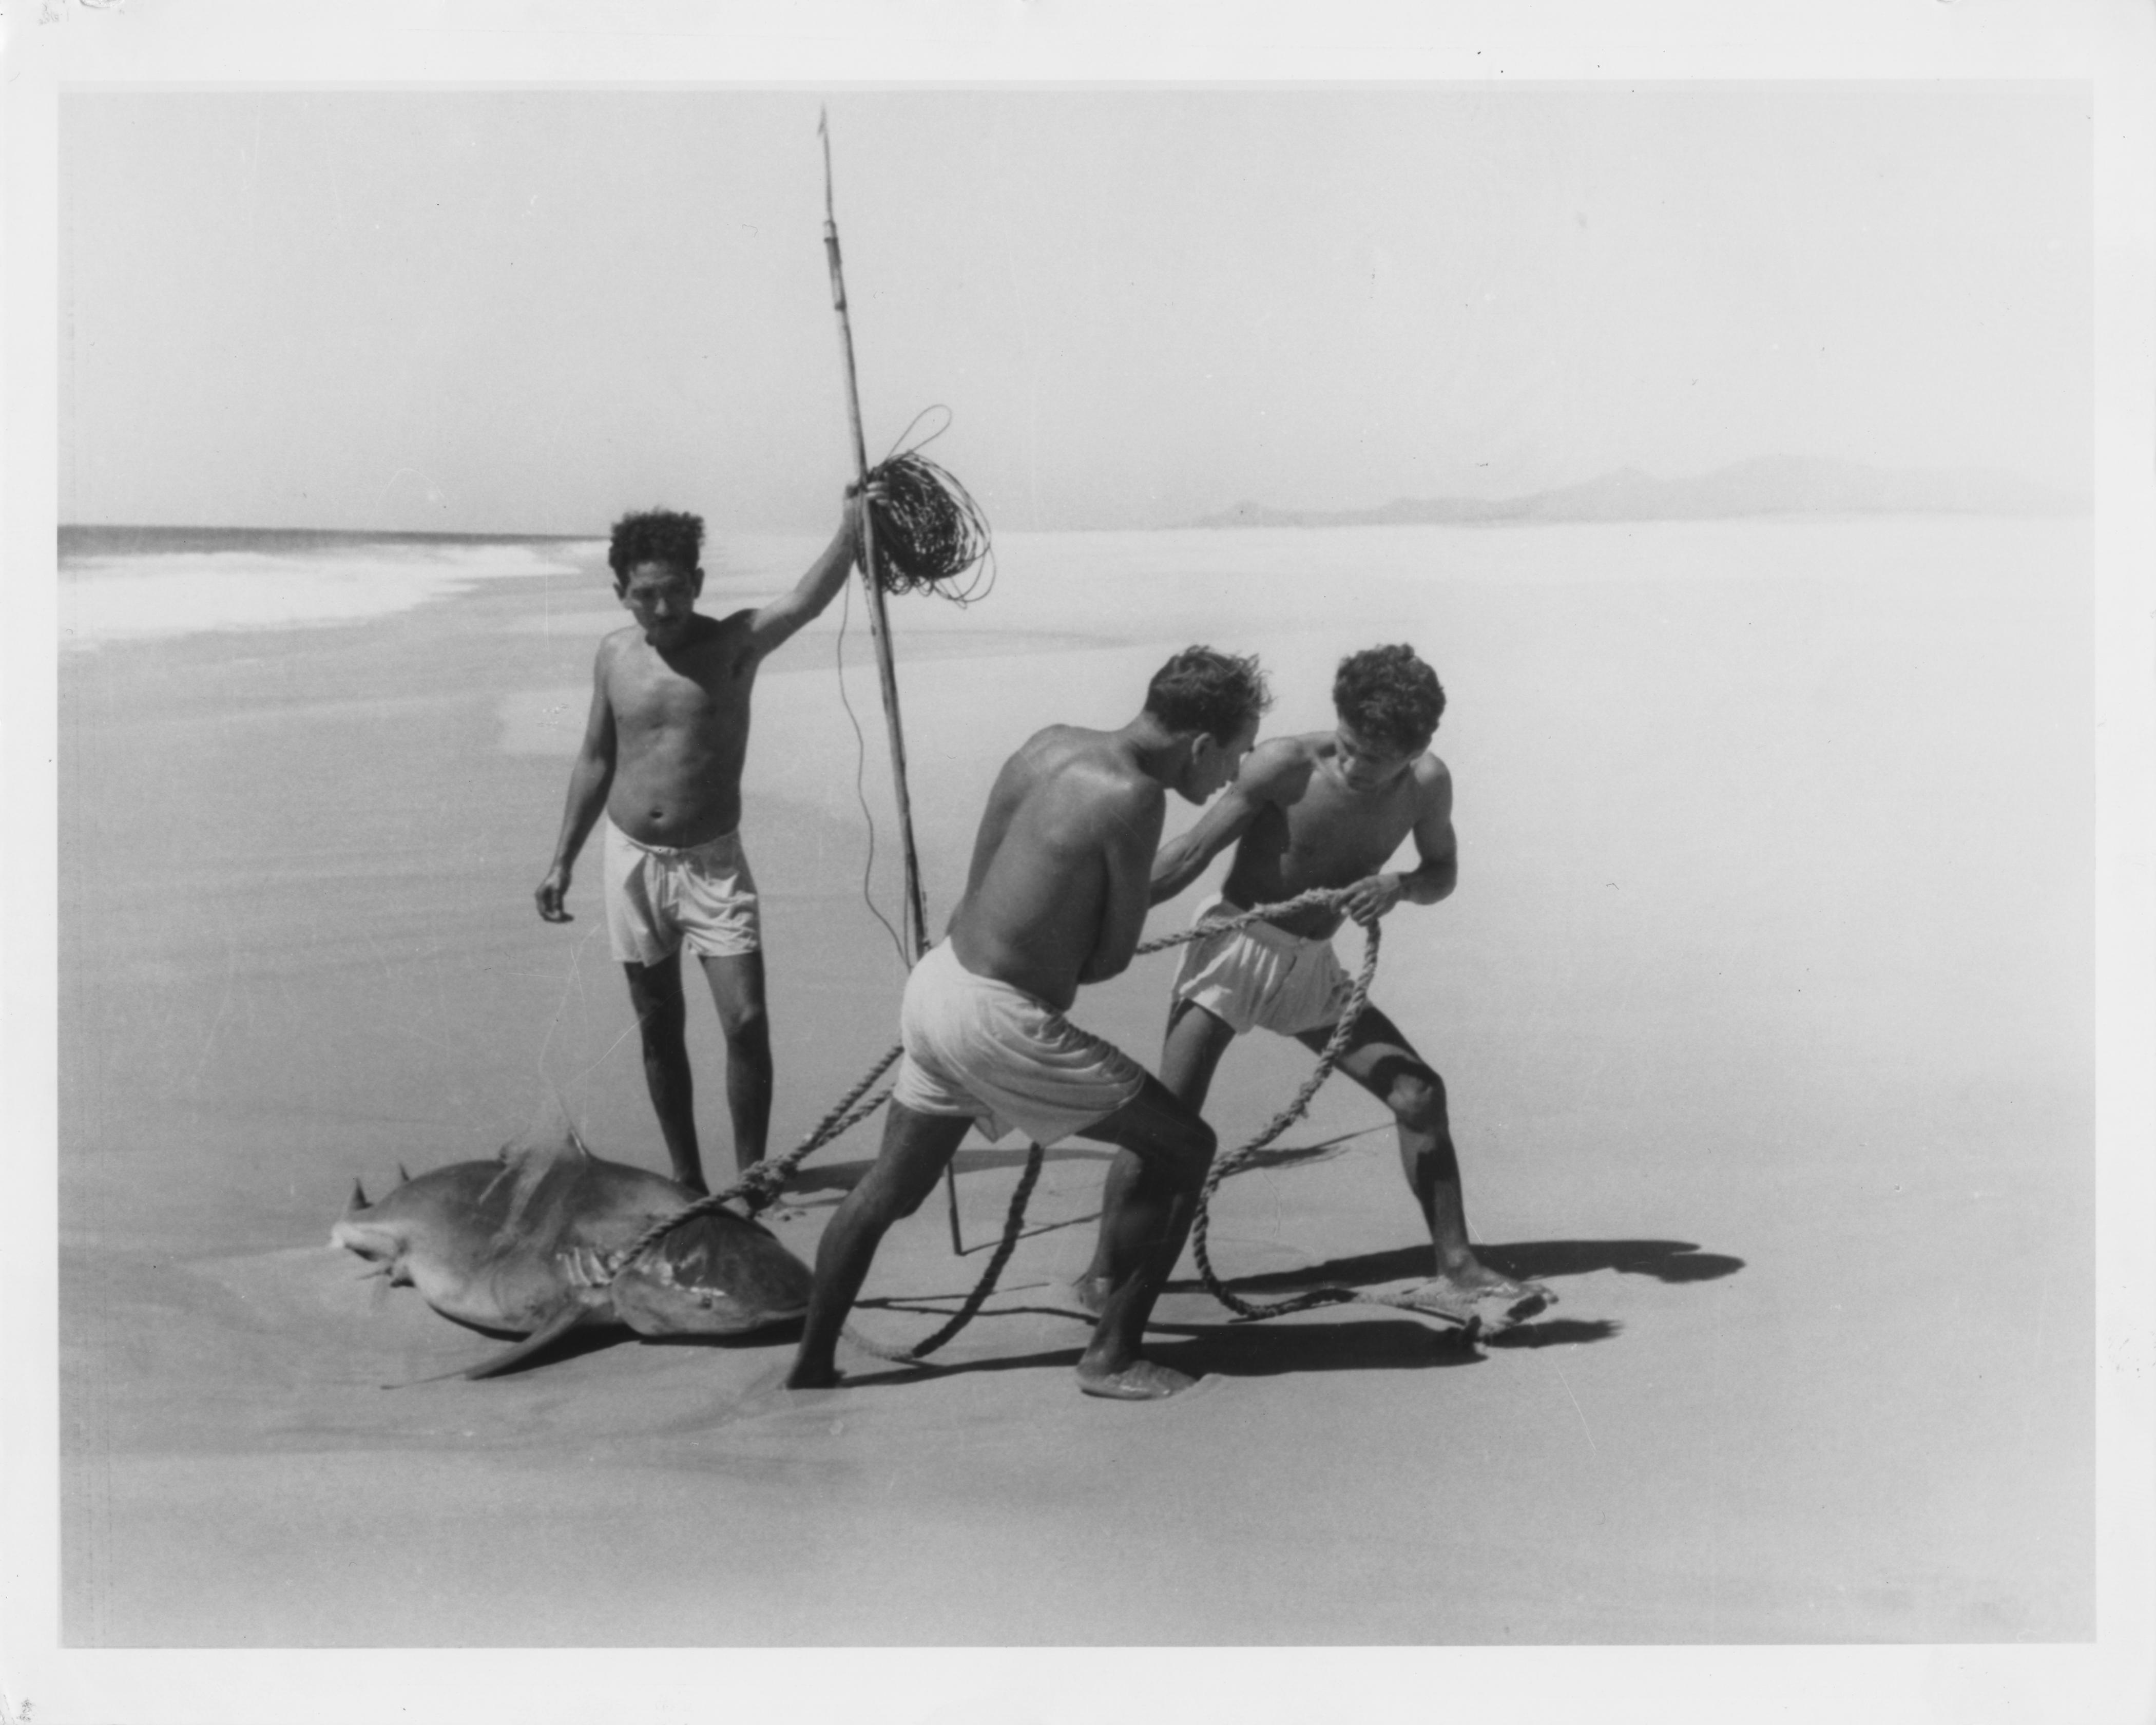 Fishermen with a shark, Acapulco, 1950